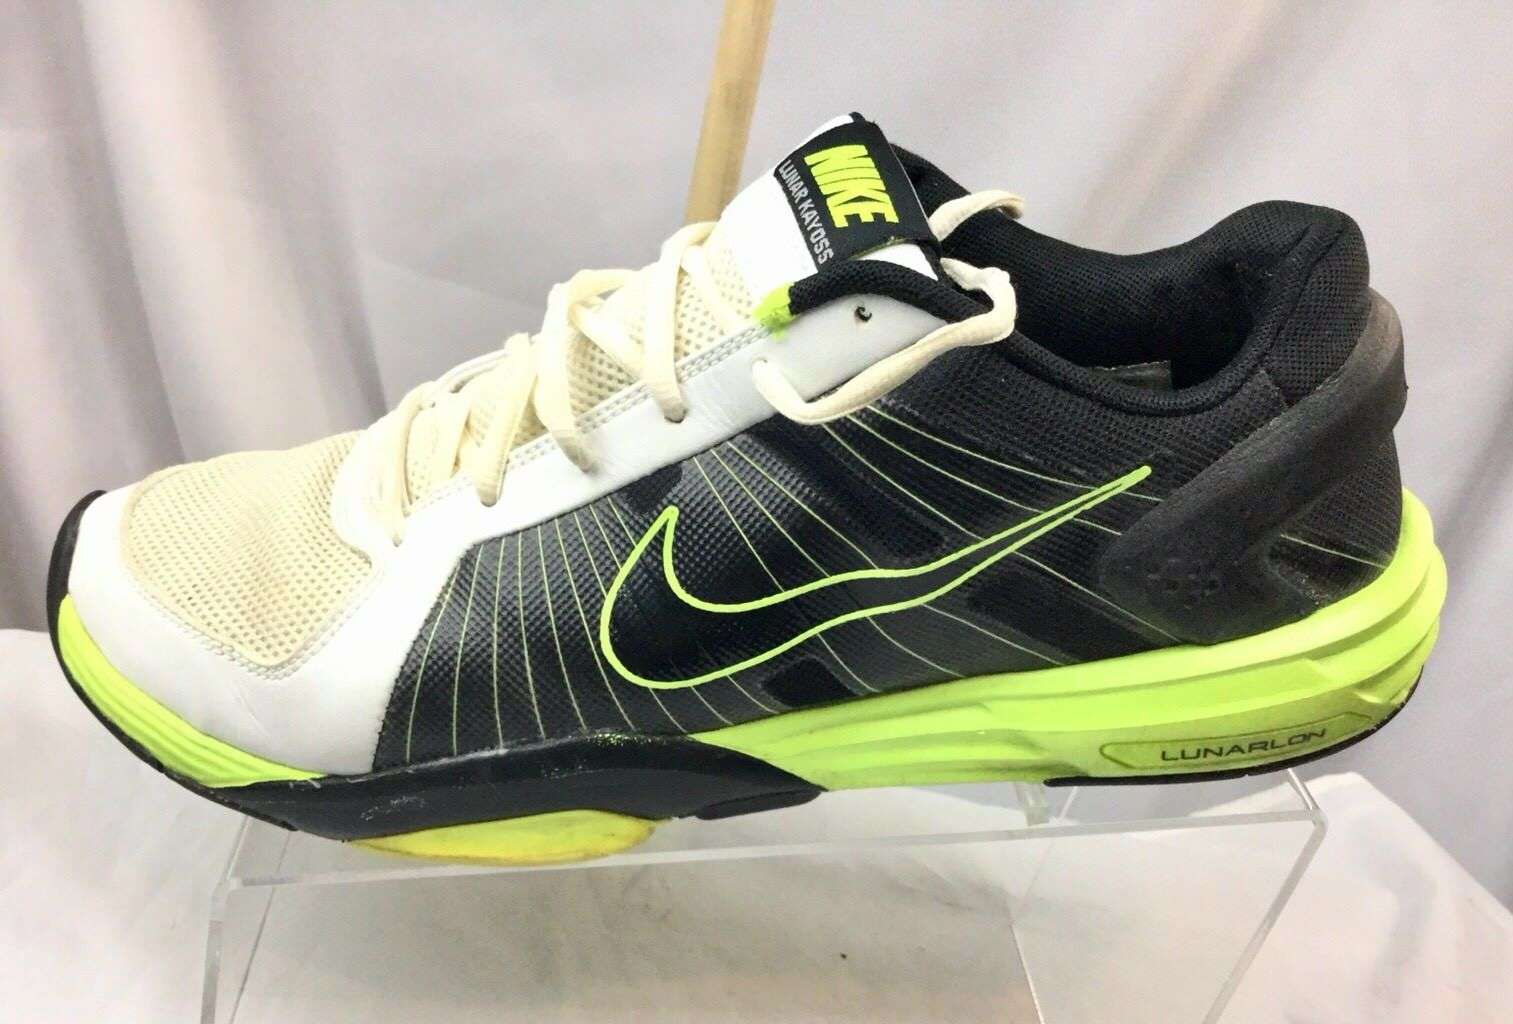 Nike Lunar Kayoss Men's Running Shoe  Comfortable Comfortable and good-looking